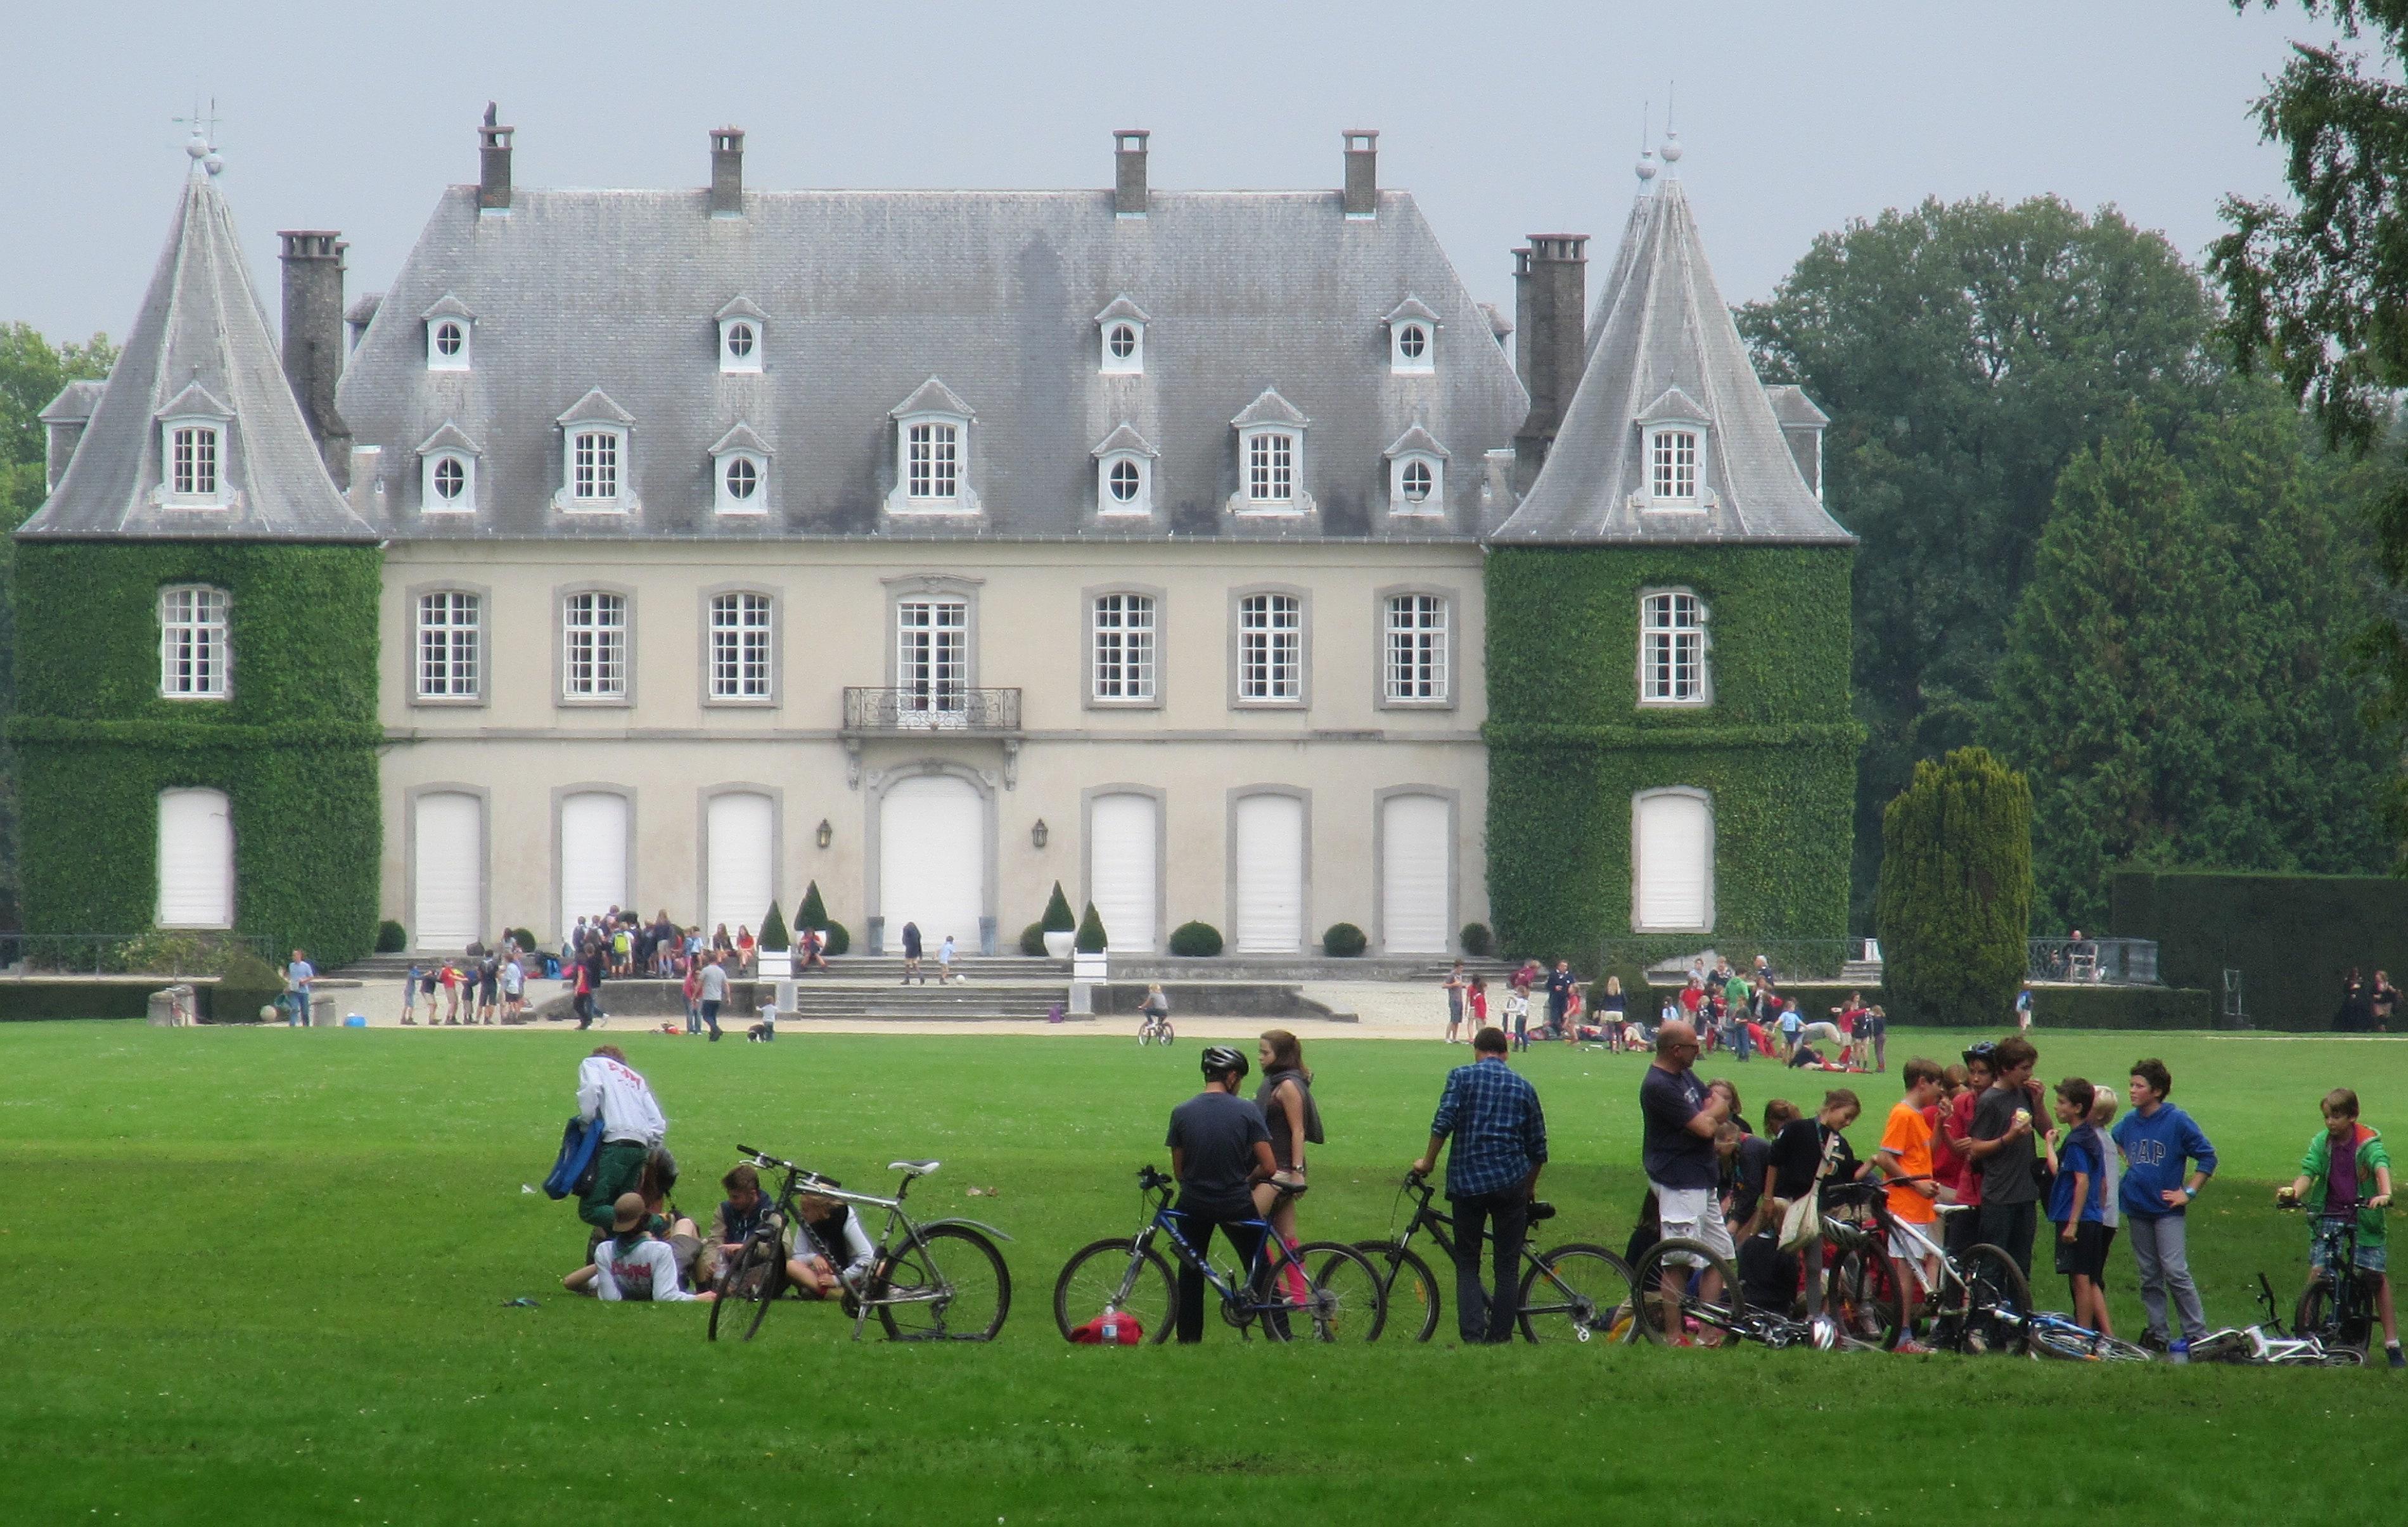 5. Chateau Solvay La Hulpe cyclisme